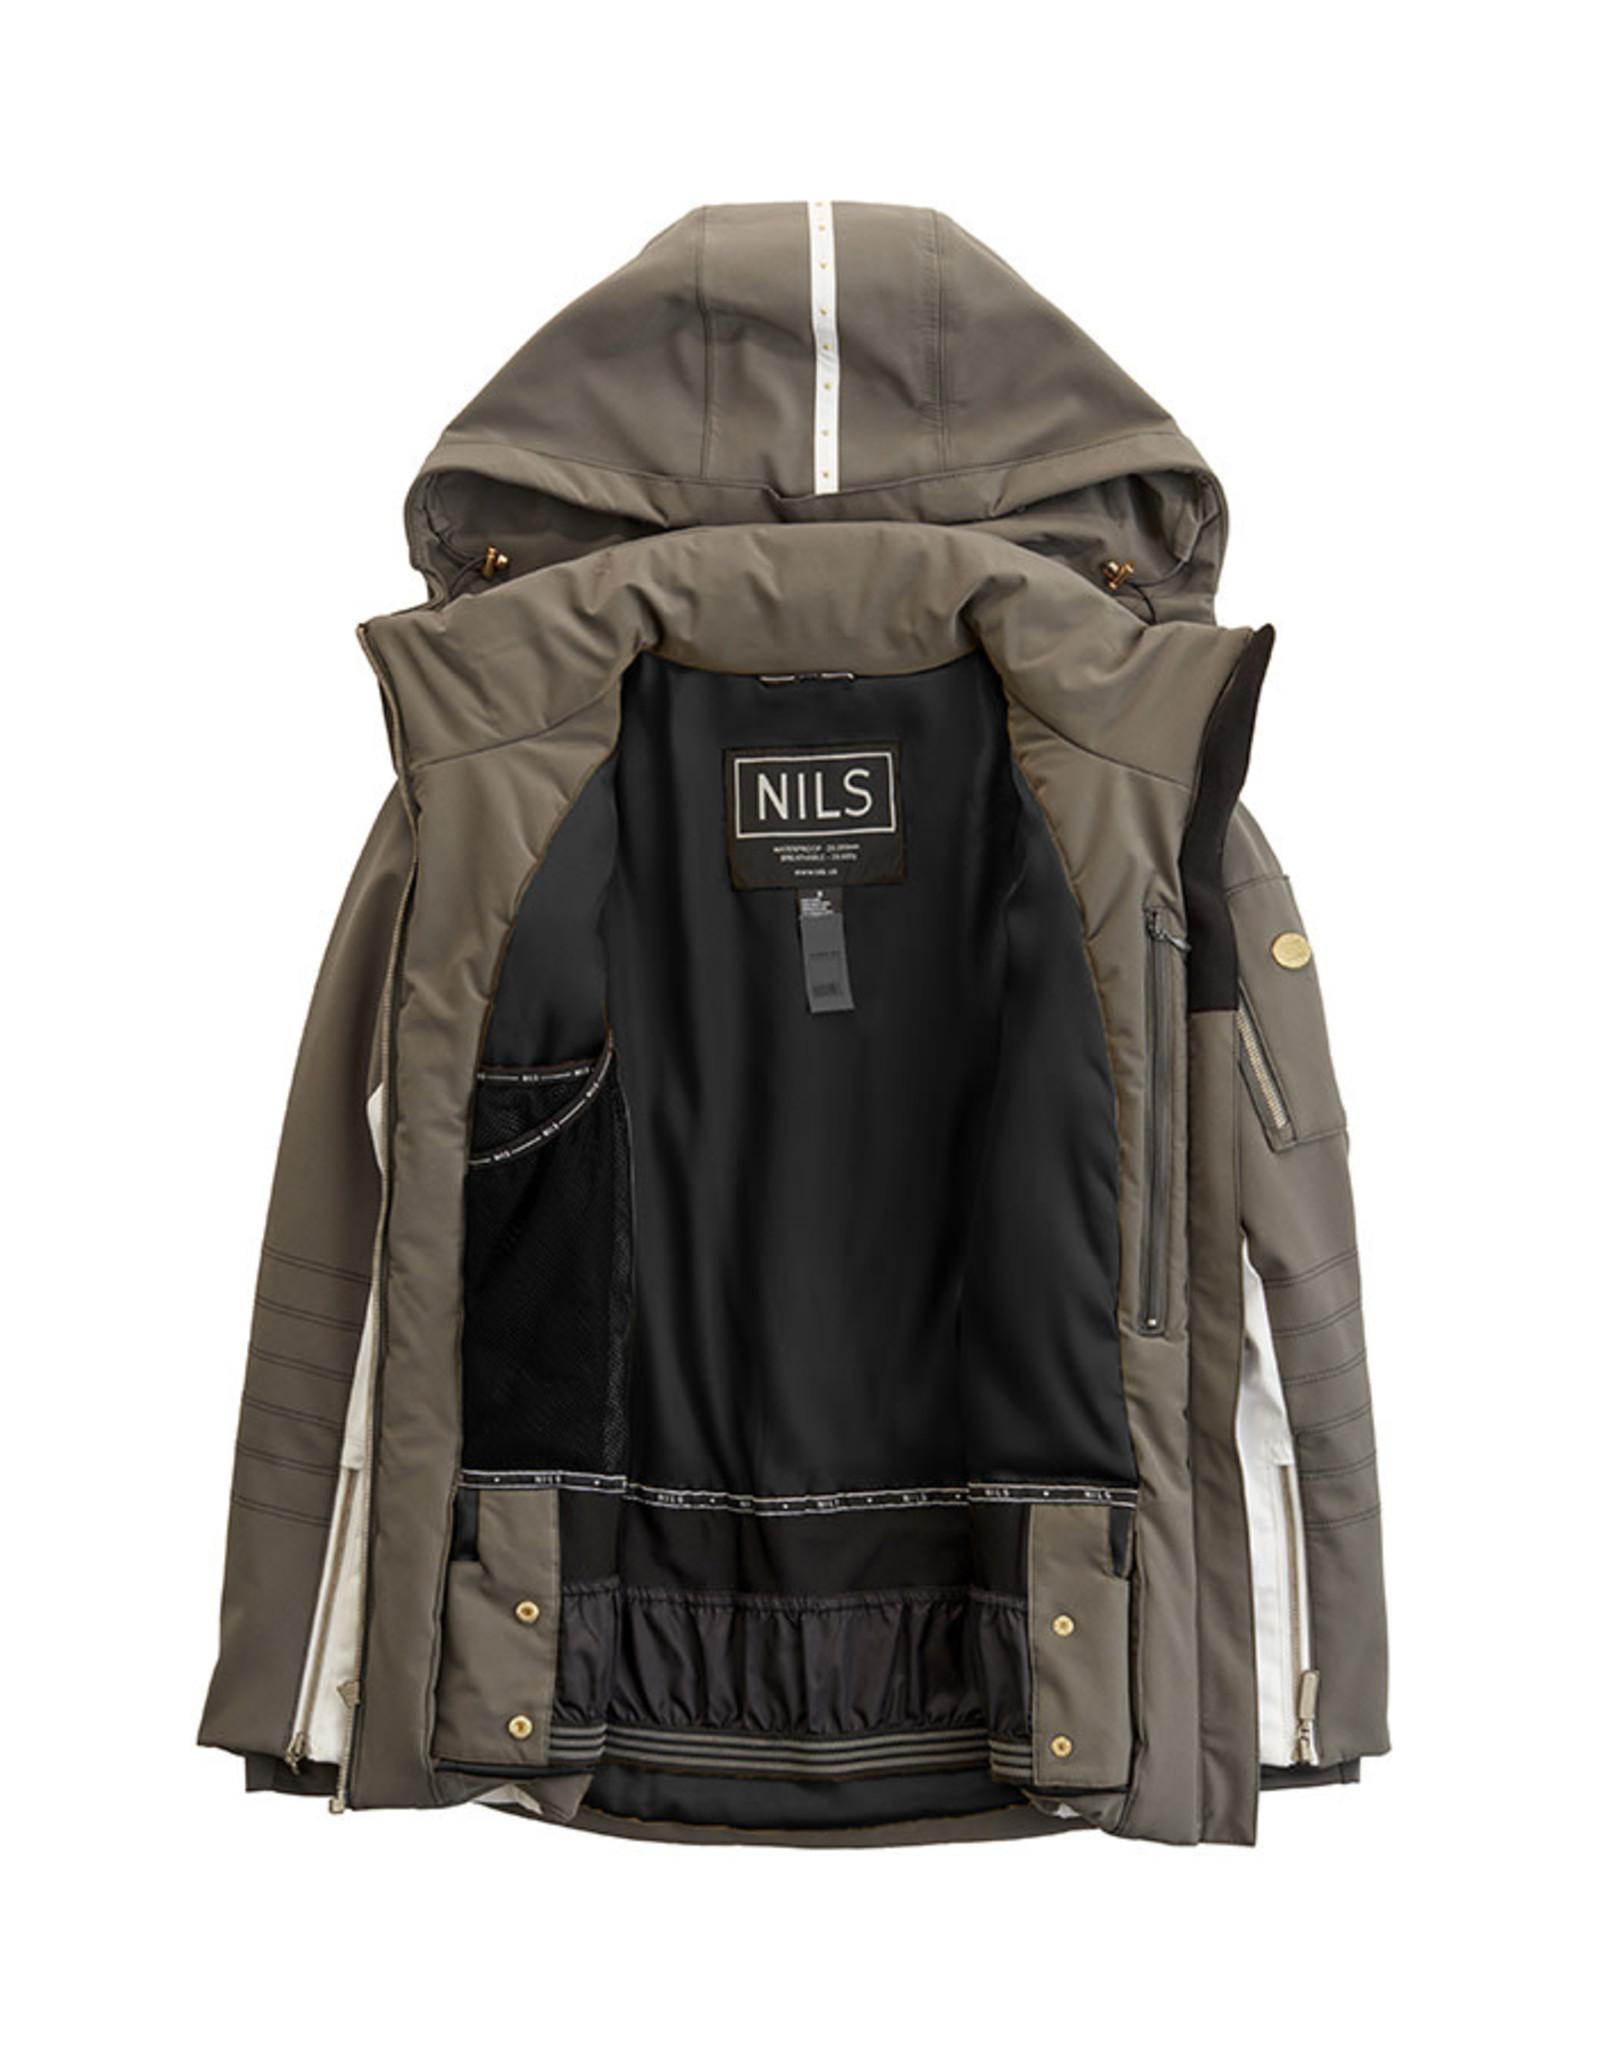 NILS NILS Isabella Jacket